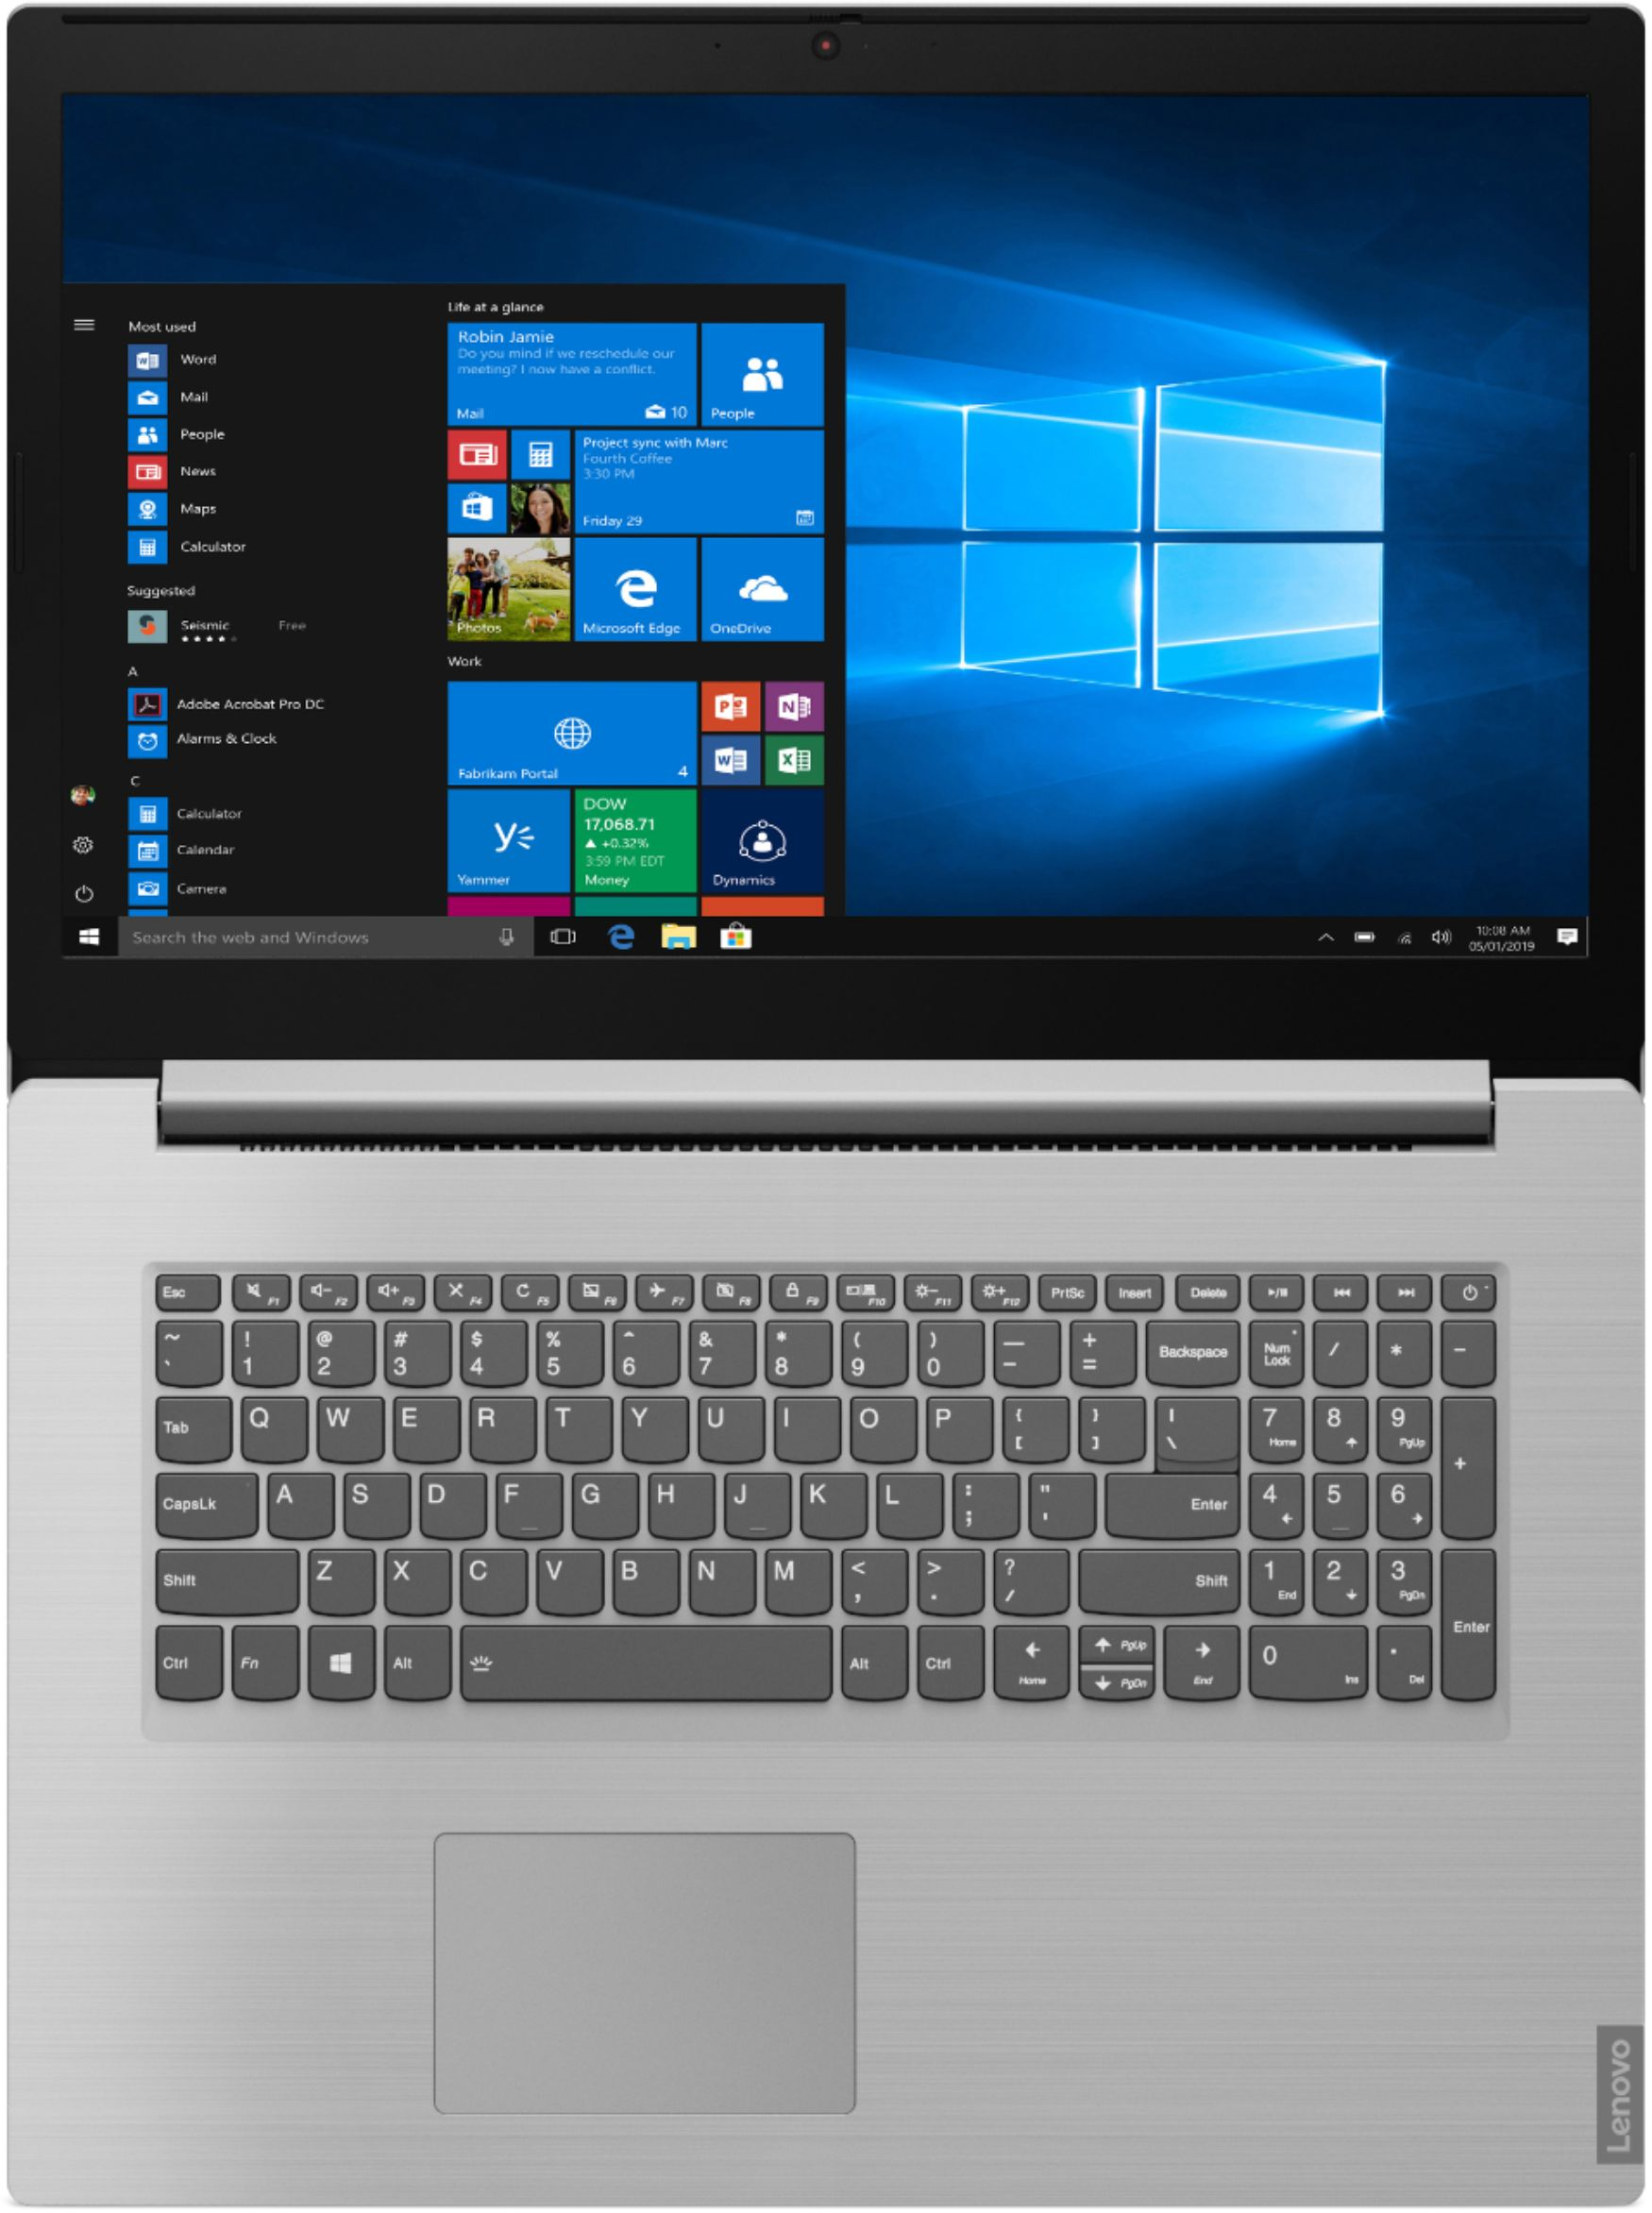 15 6″ Lenovo IdeaPad L340 Laptop with AMD Ryzen 5 3500U, Radeon Vega